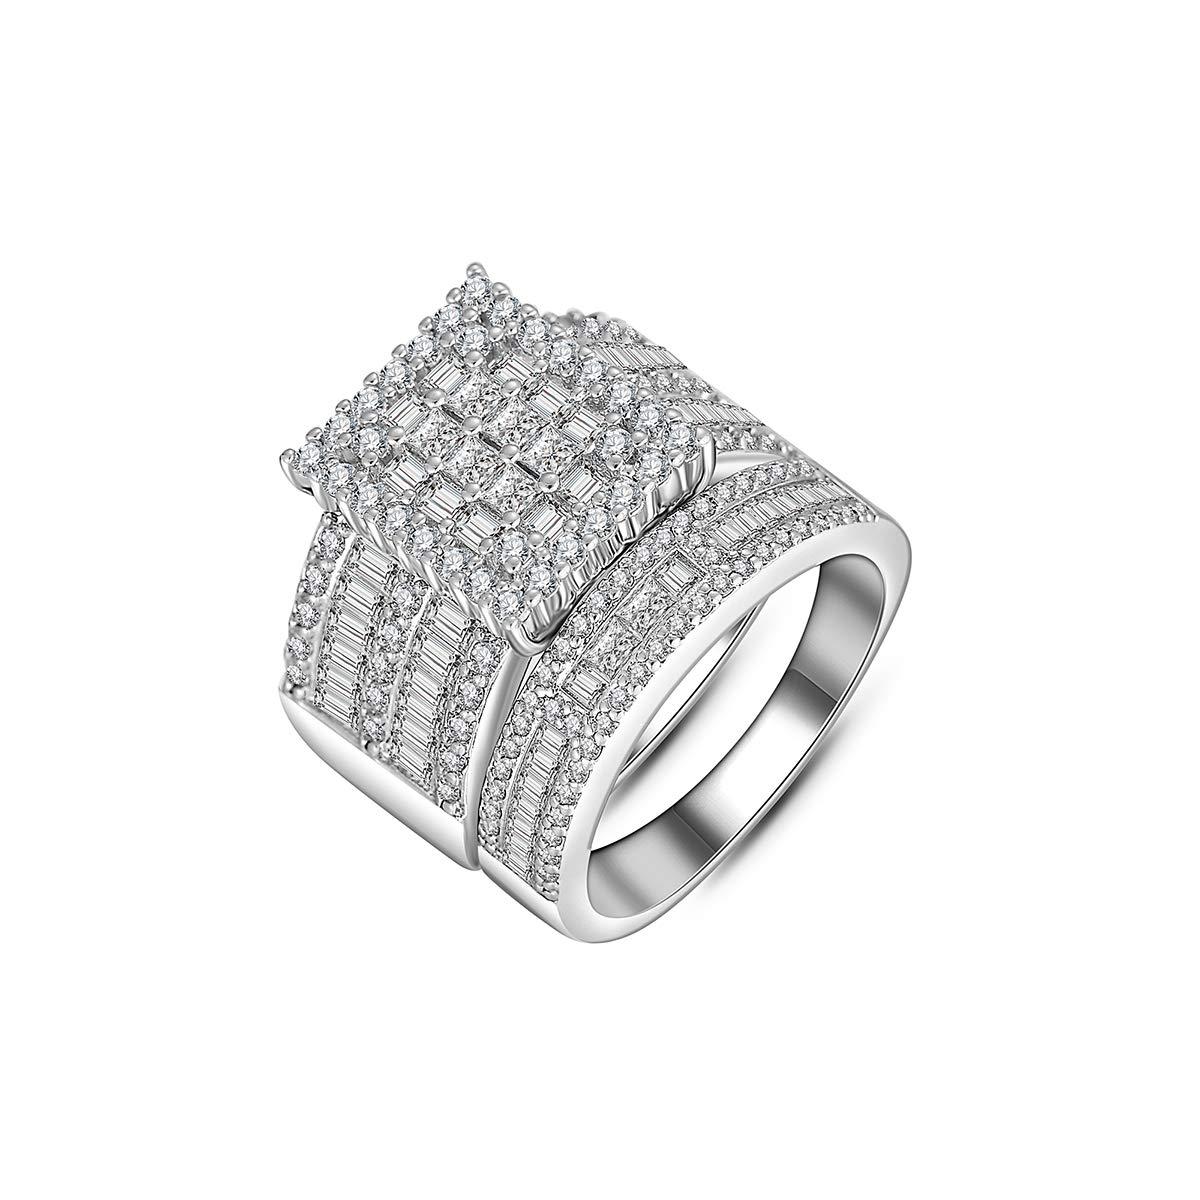 Hiyong Women Wedding Ring Set White Gold Cubic Zirconia Wedding Rings Fashion Sliver Engagement Rings for Women